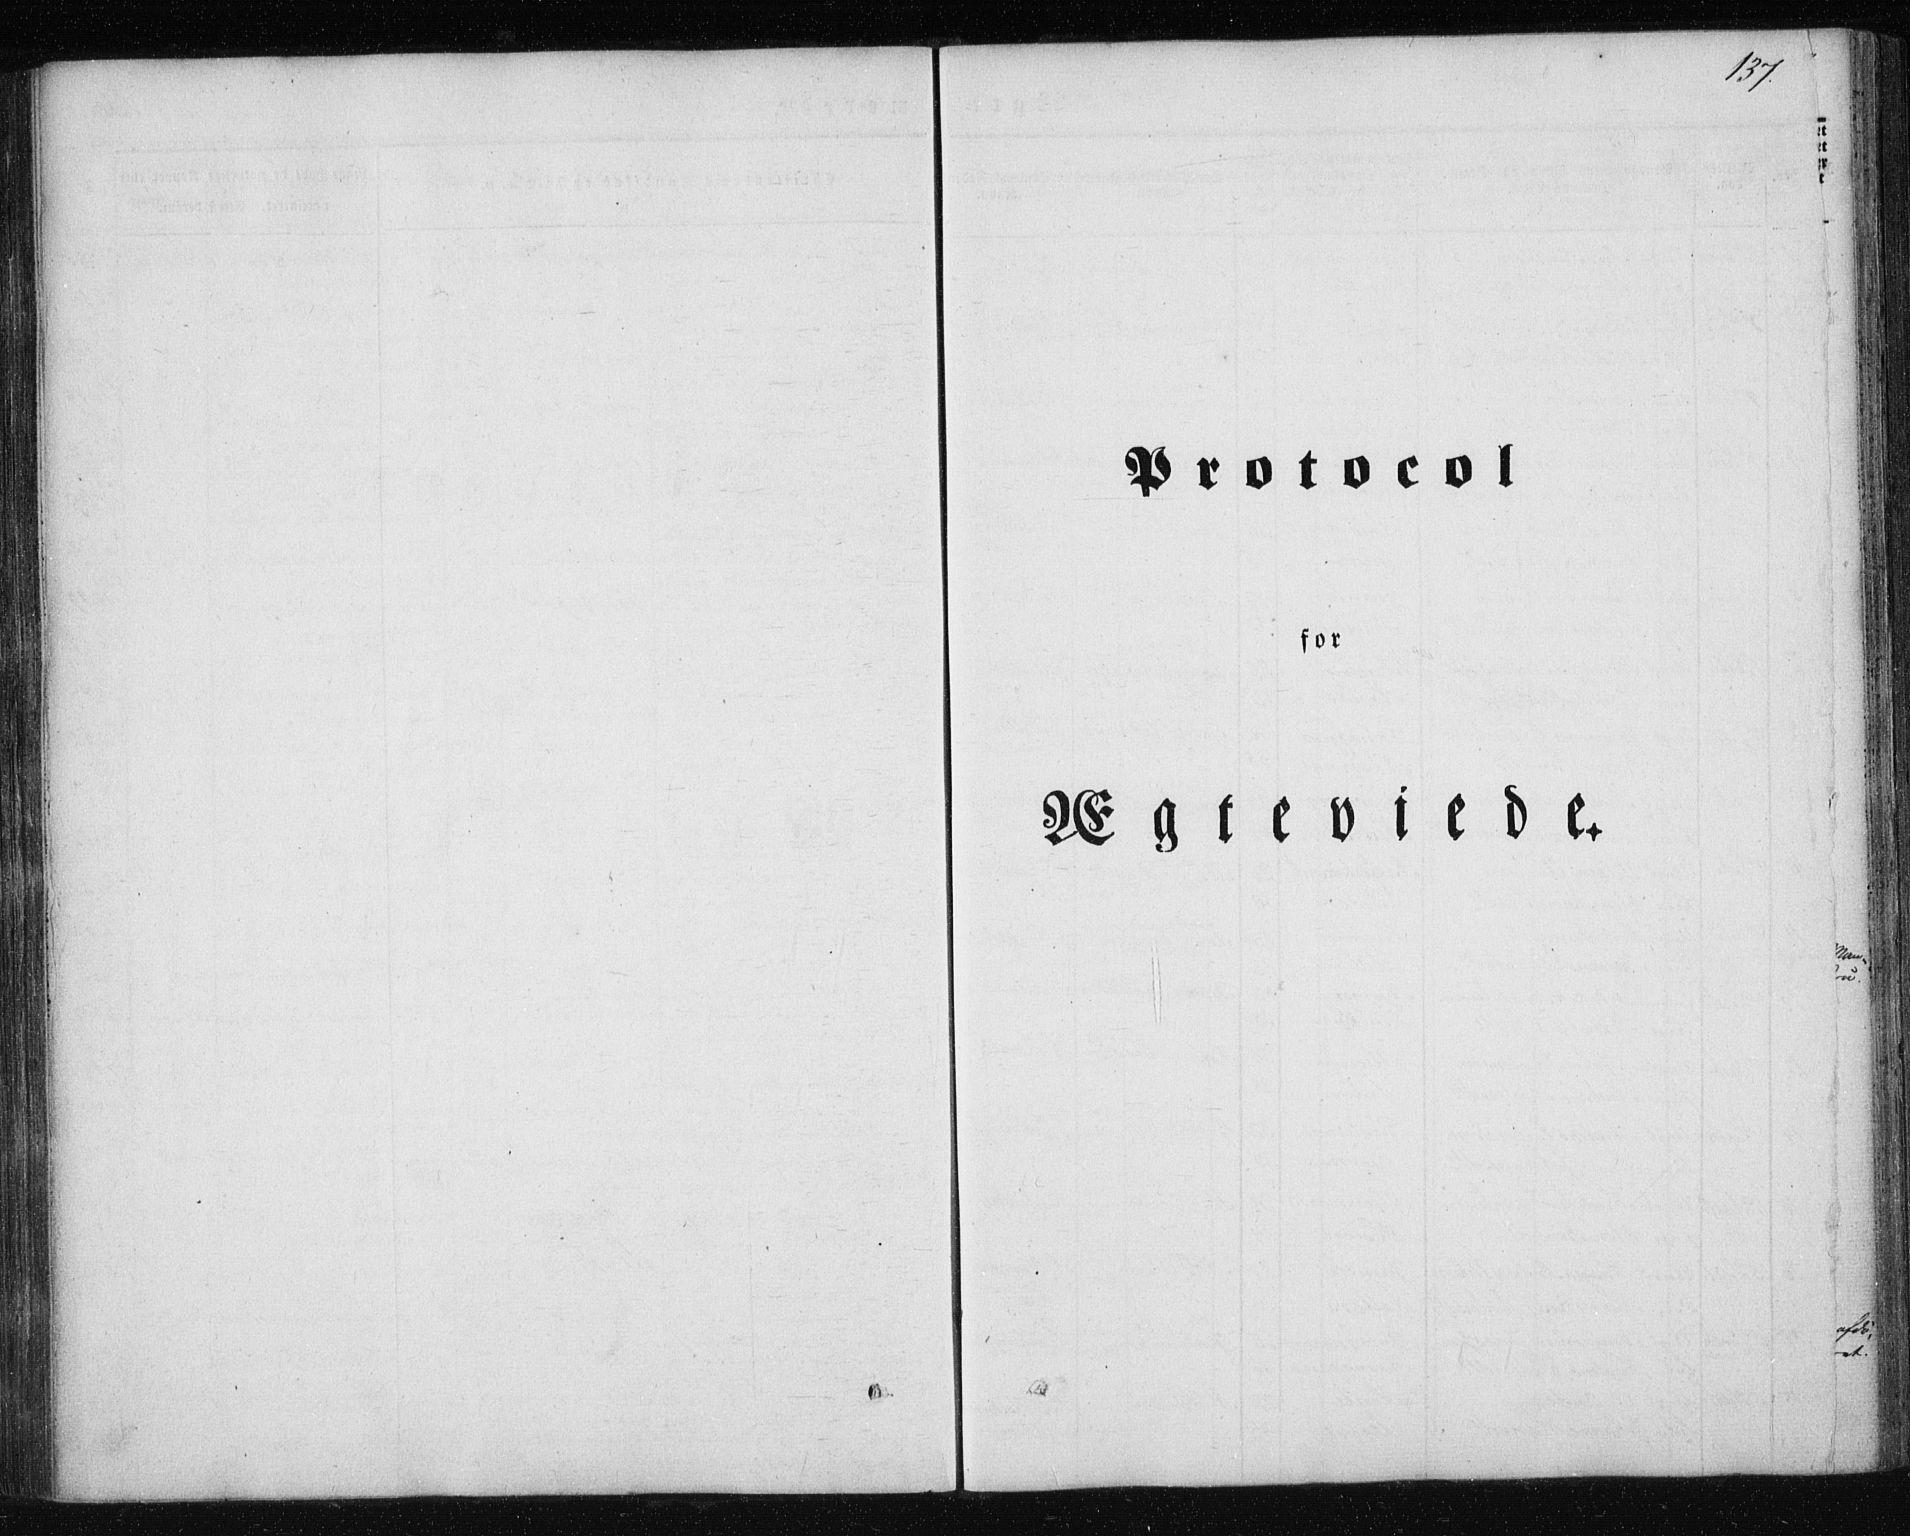 SAT, Ministerialprotokoller, klokkerbøker og fødselsregistre - Nordland, 827/L0391: Ministerialbok nr. 827A03, 1842-1852, s. 137